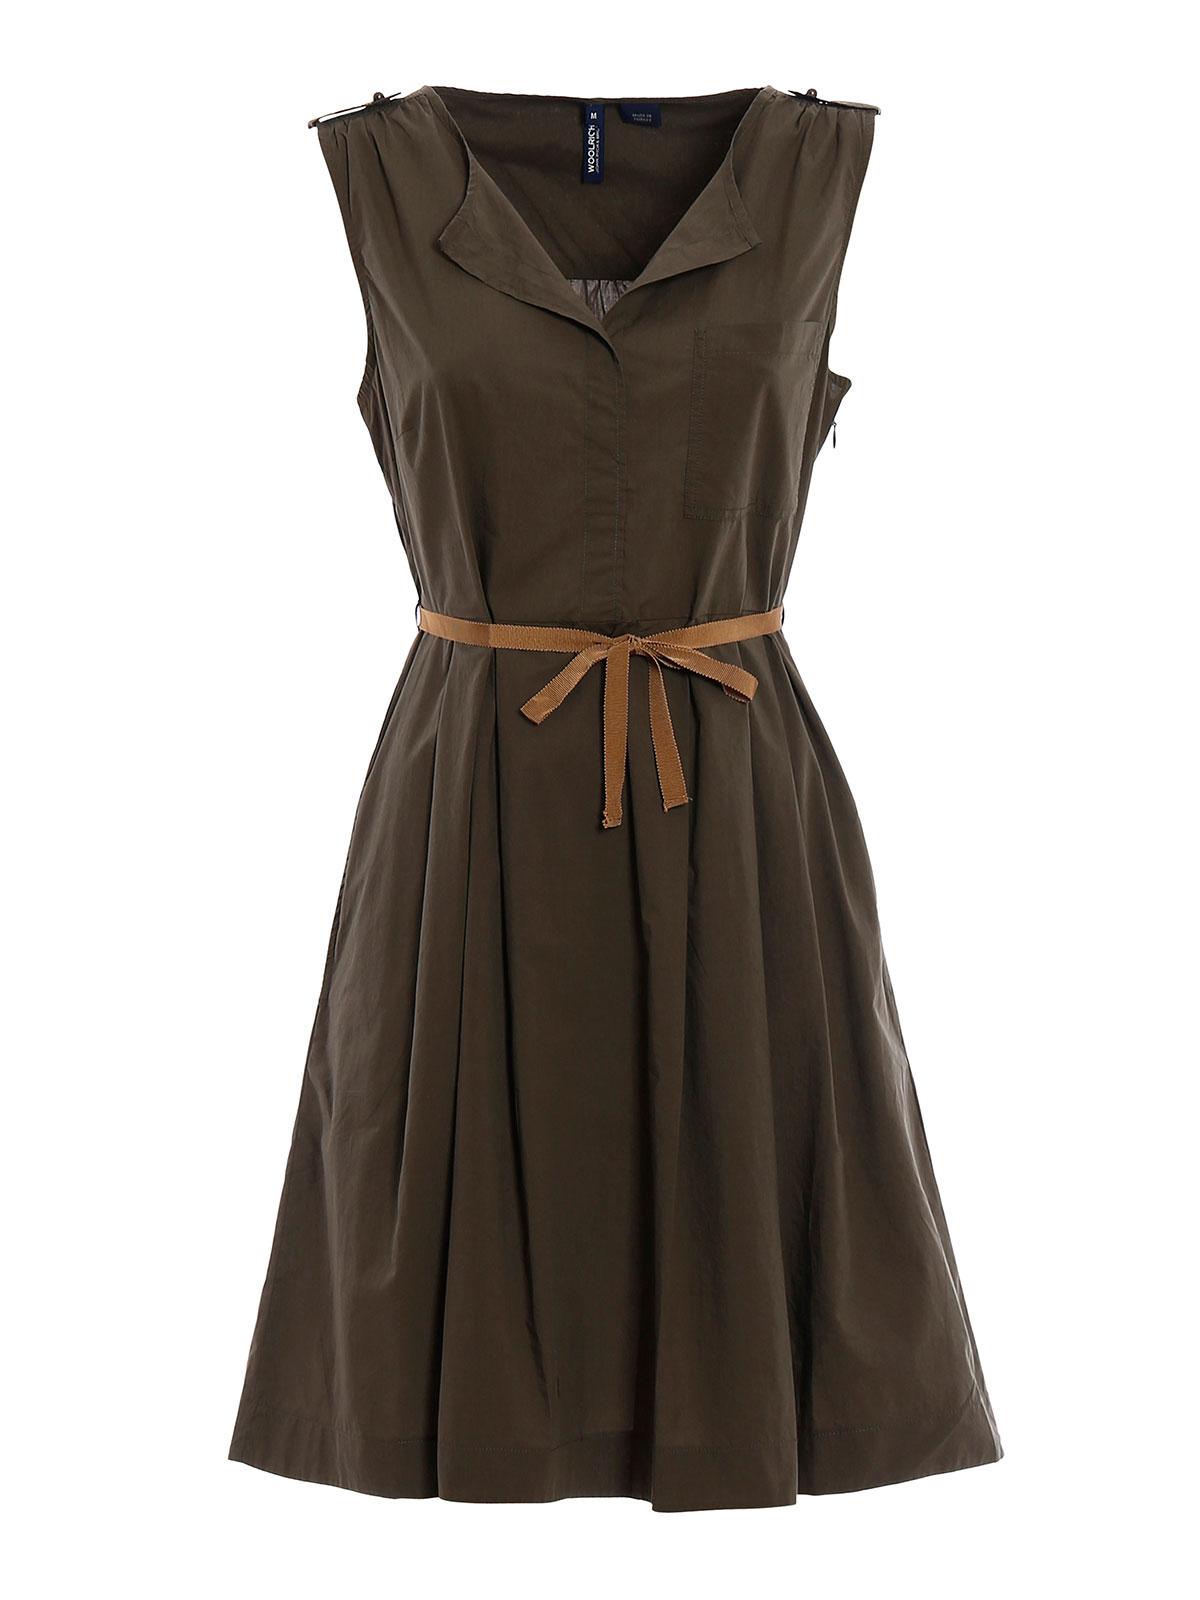 Picture of WOOLRICH | Women's Sleeveless Dress